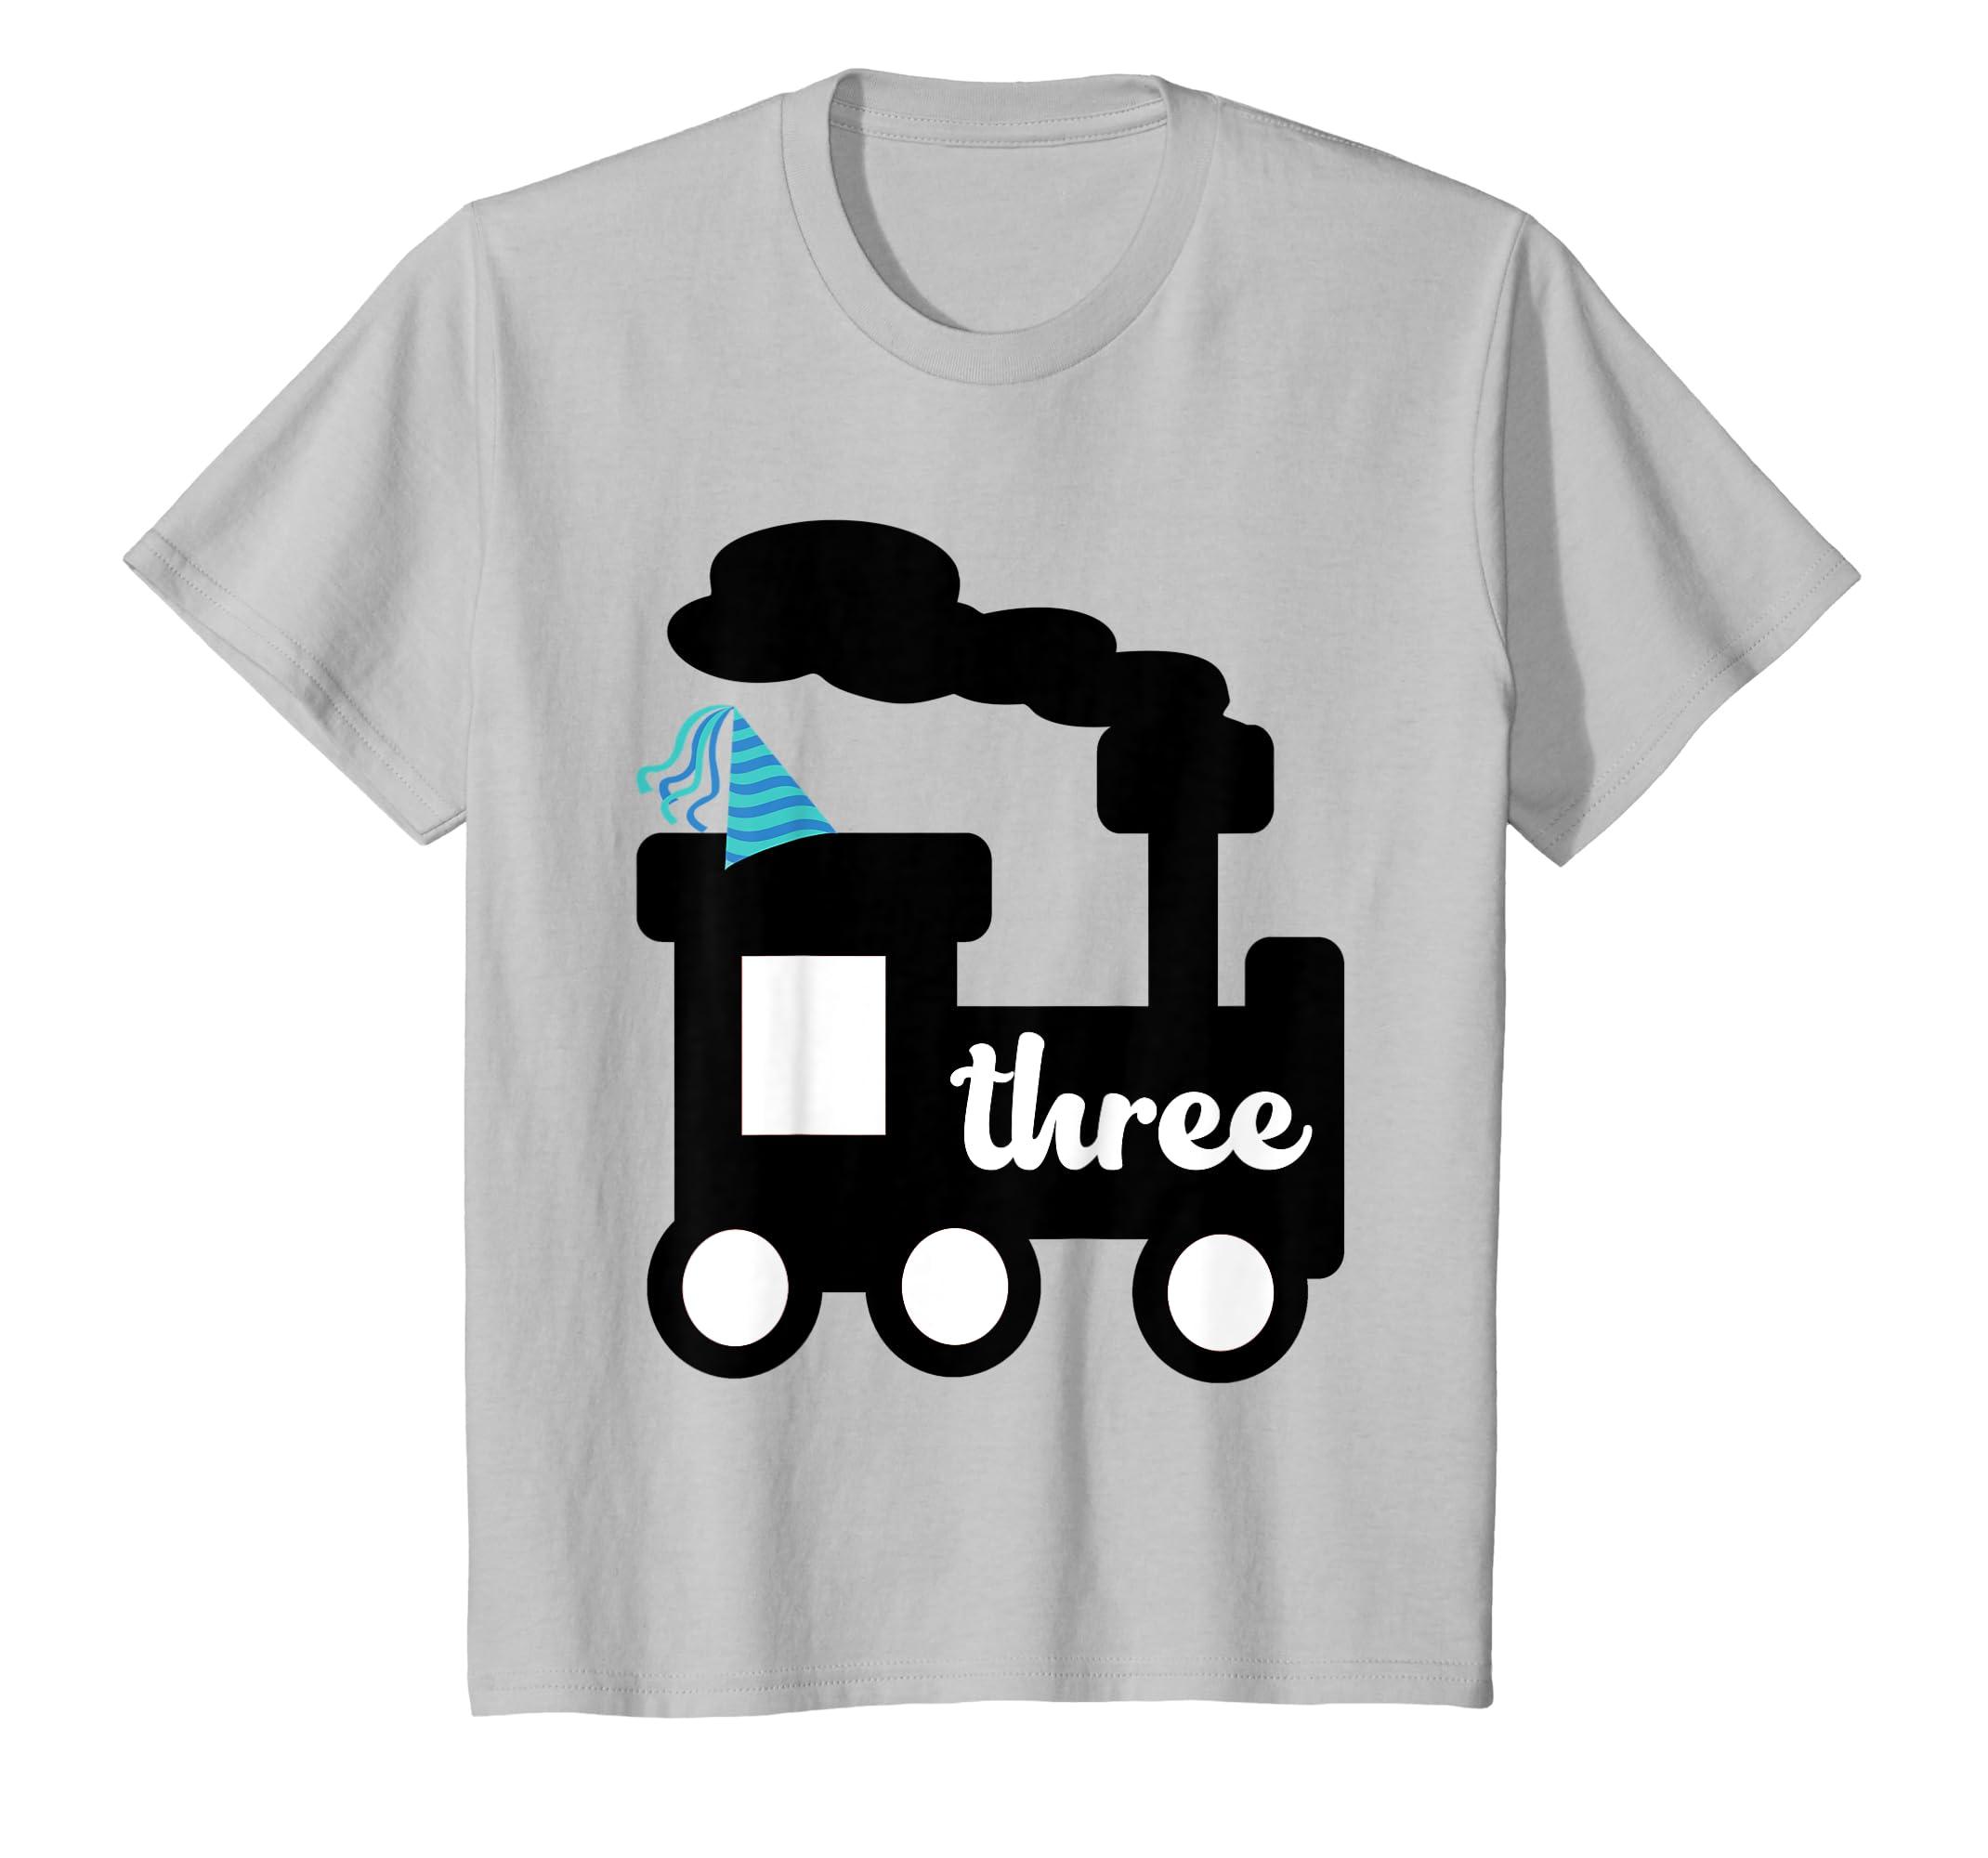 Amazon Kids 3 Year Old 3rd Birthday Shirt Boy Locomotive Train Gift Clothing